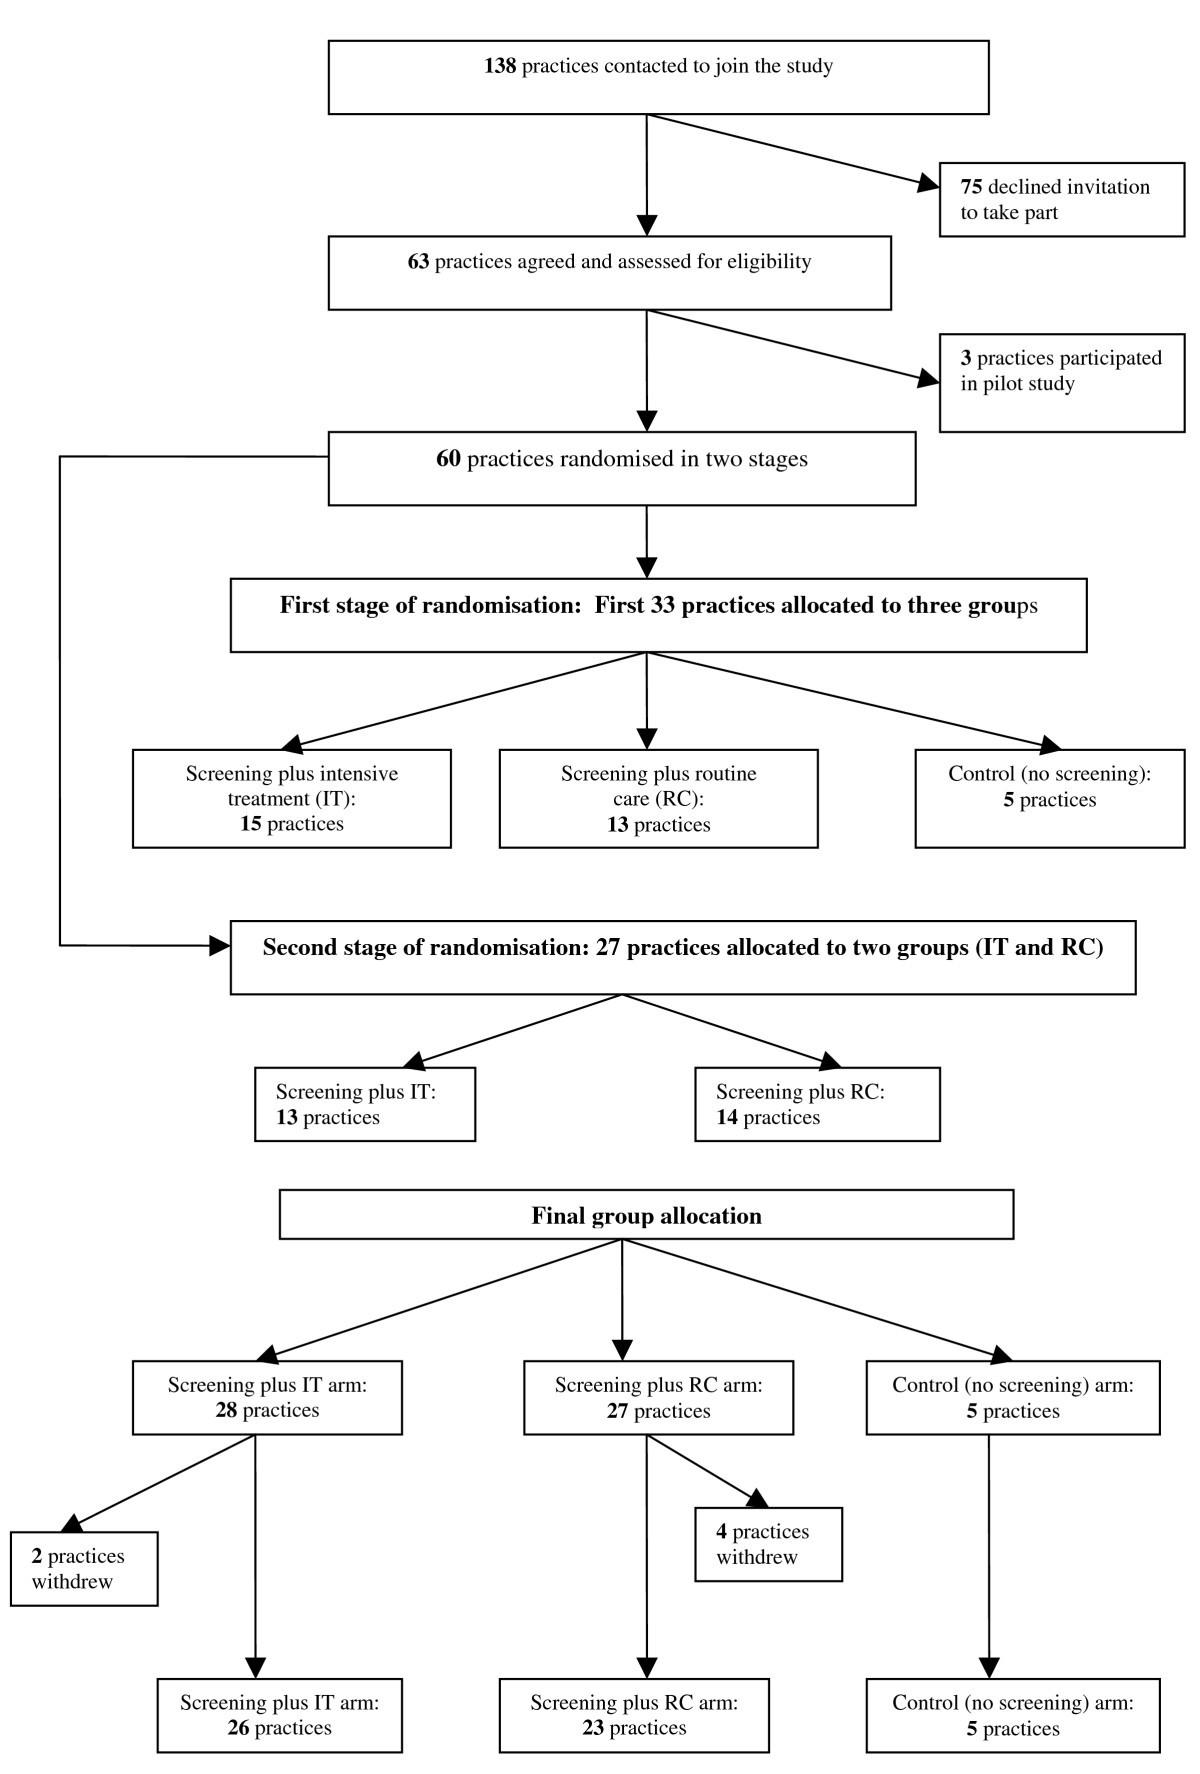 The Addition Cambridge Trial Protocol A Cluster Randomised Cooper Wiring Diagrams Mini Diagram Jensen Figure 1